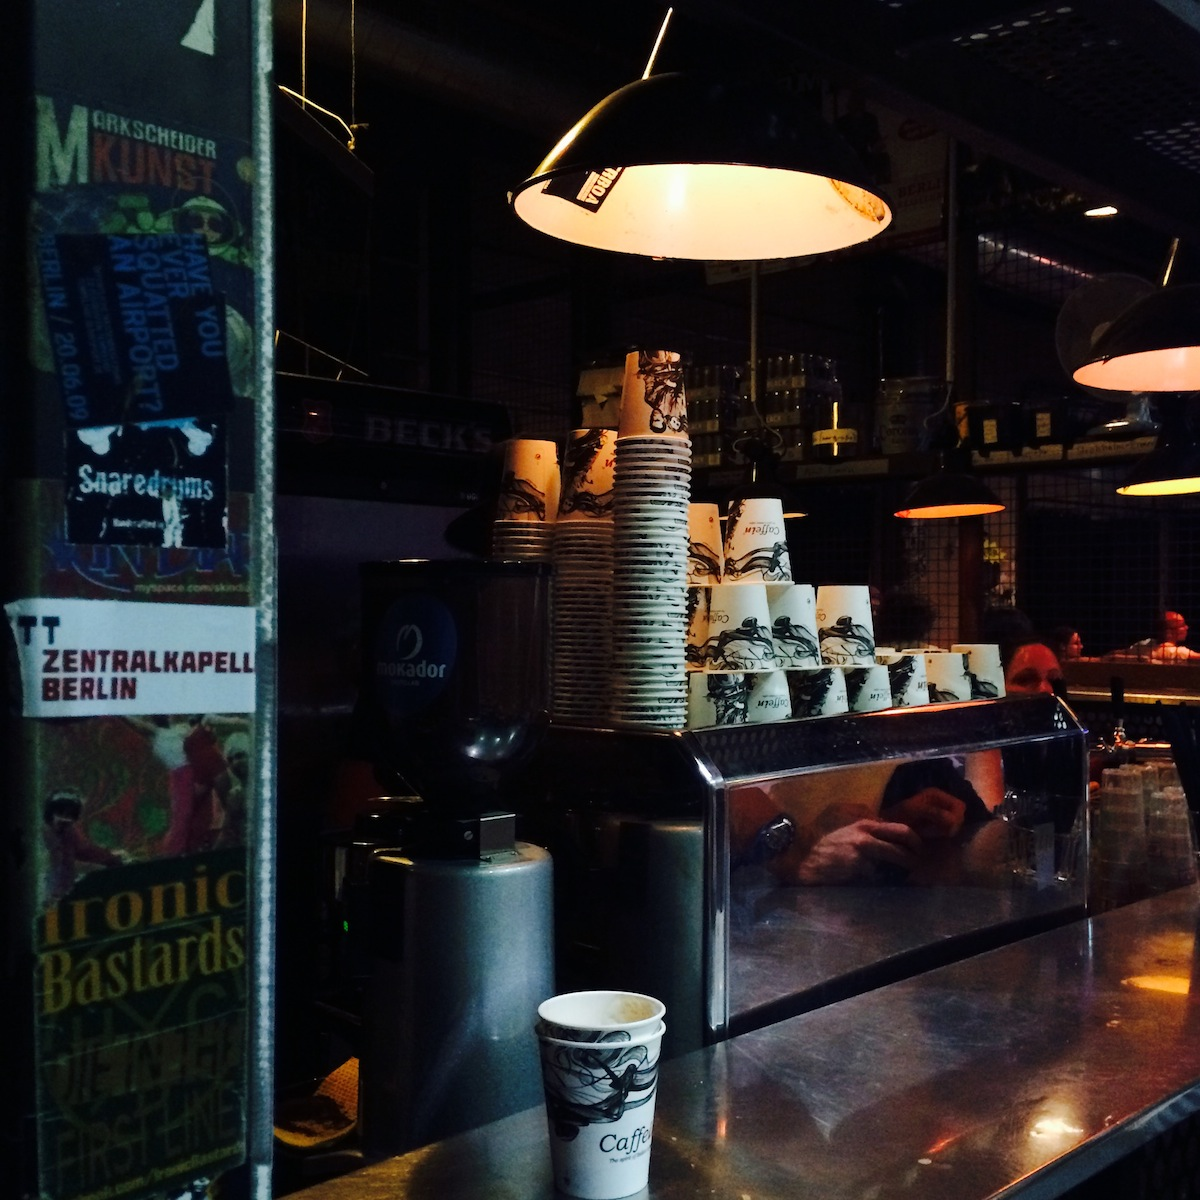 Morning Gloryville Berlin Coffee Bar